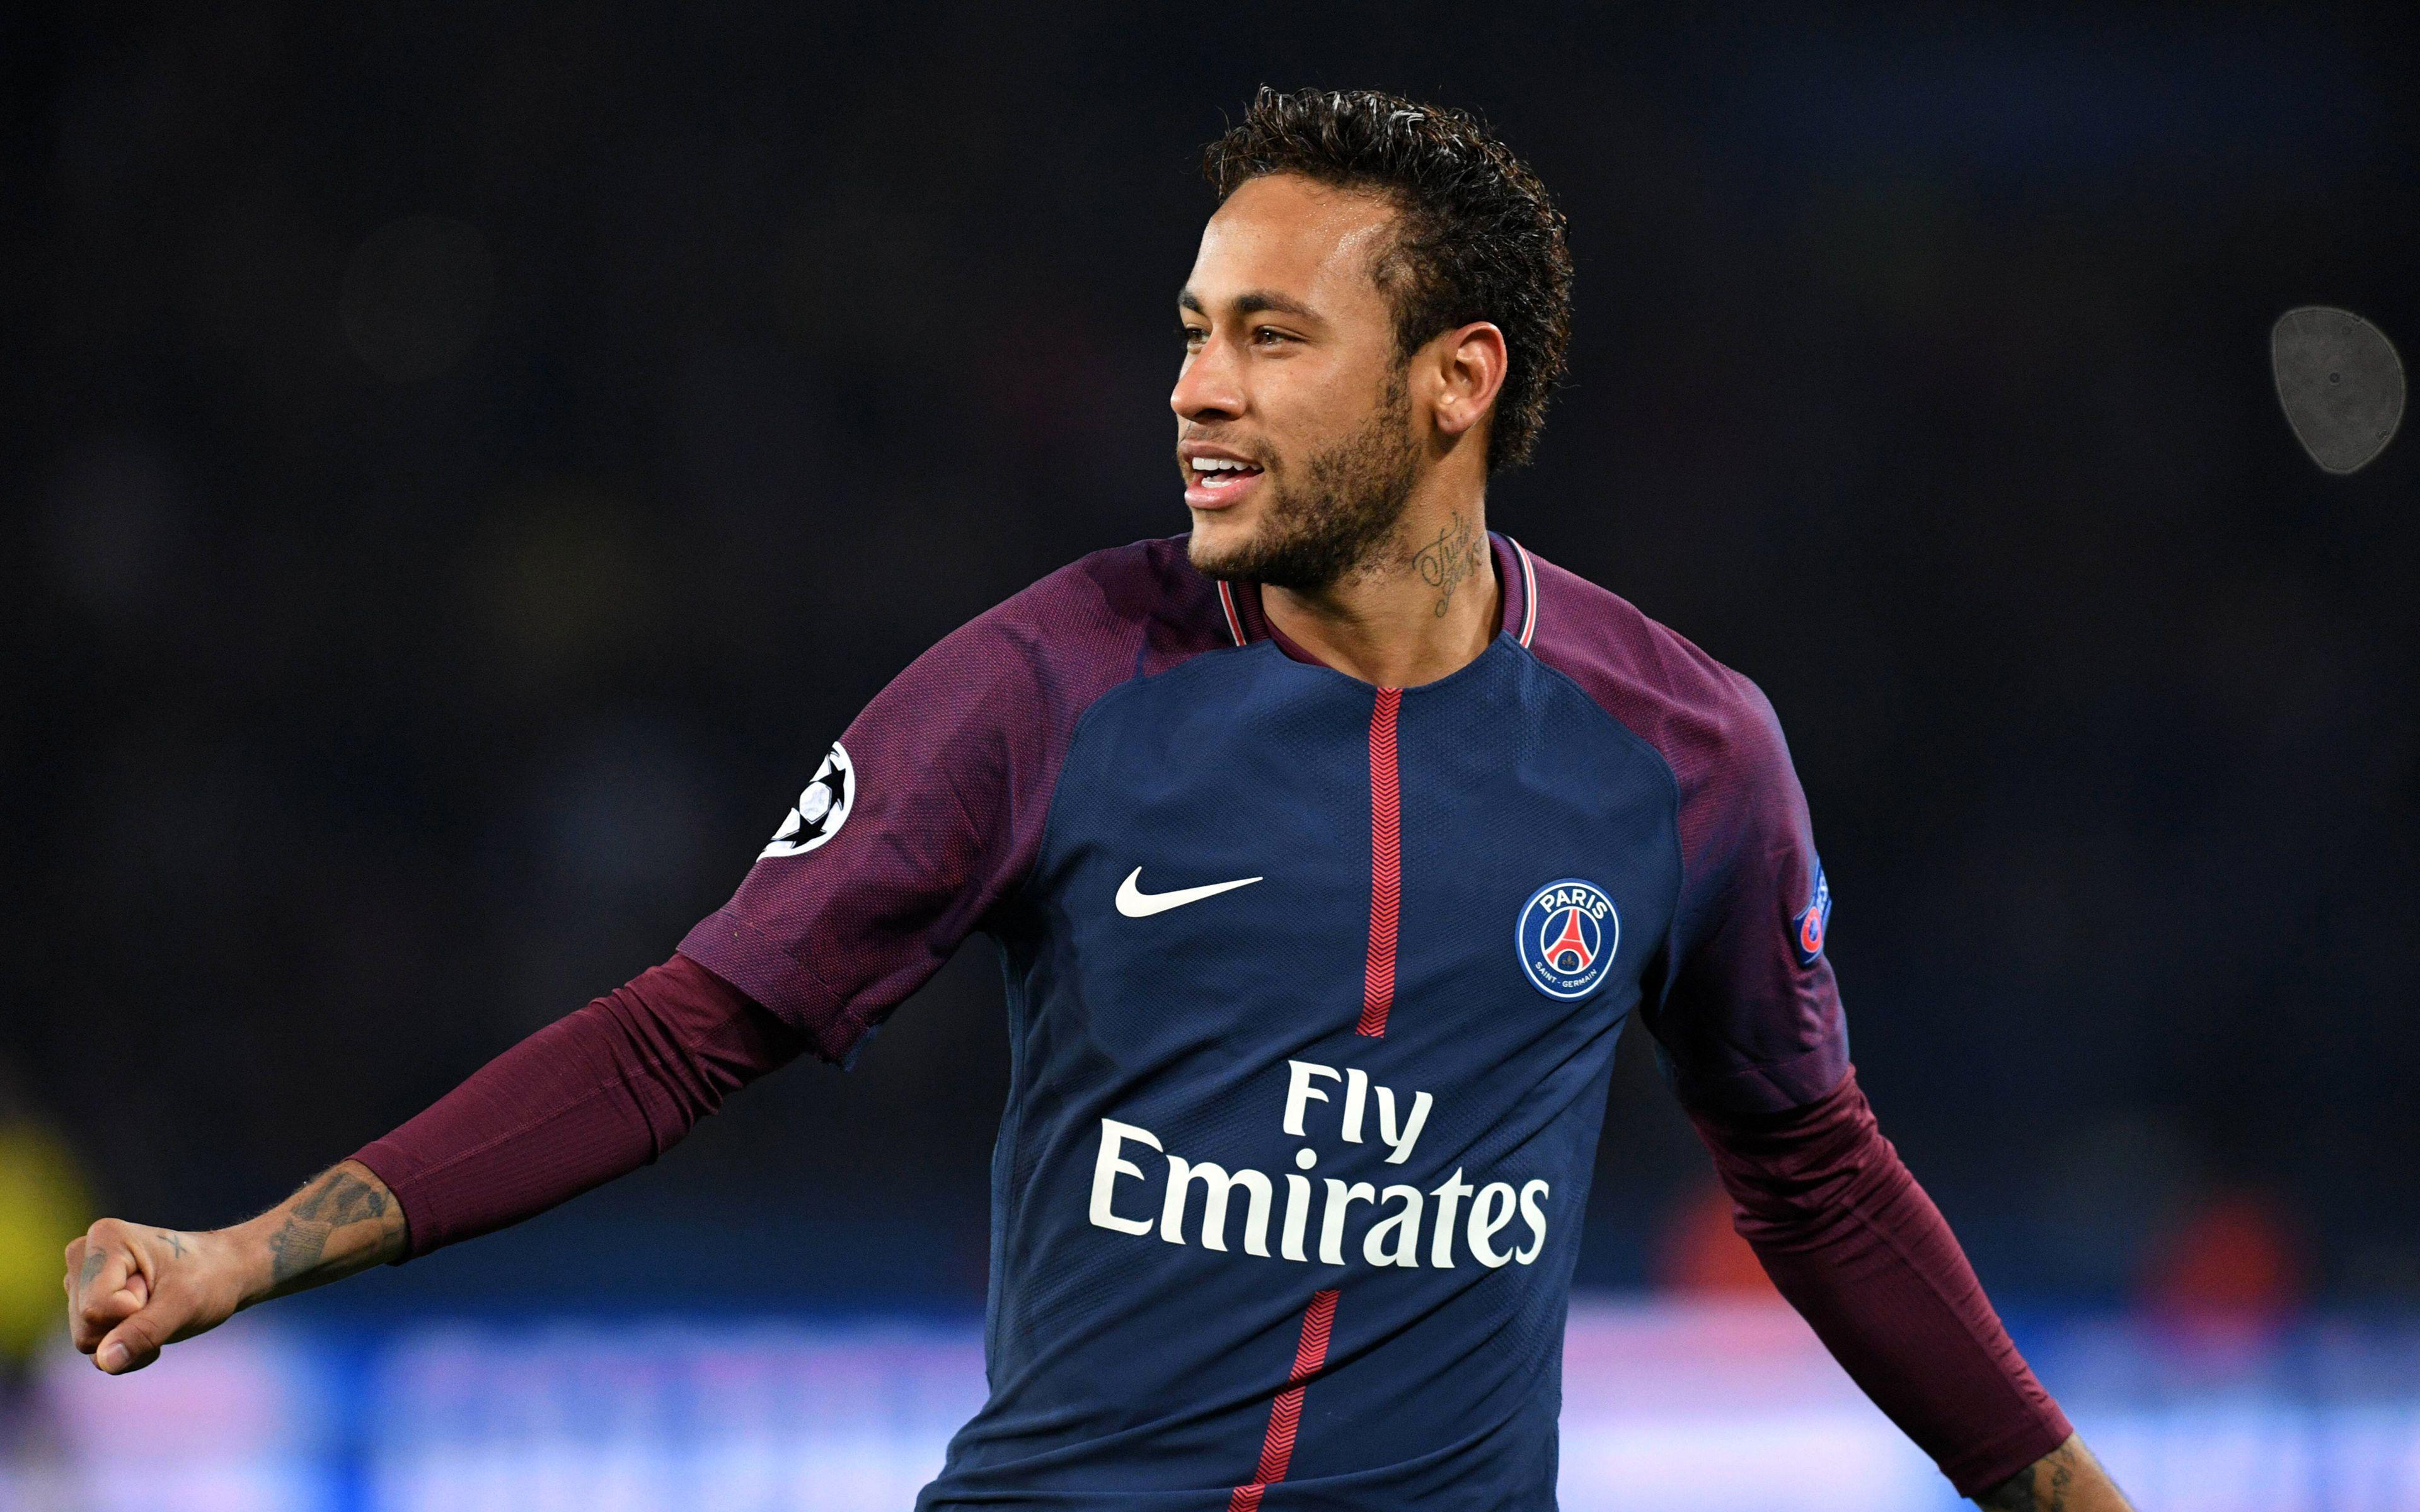 Neymar Paris Wallpapers - Wallpaper Cave